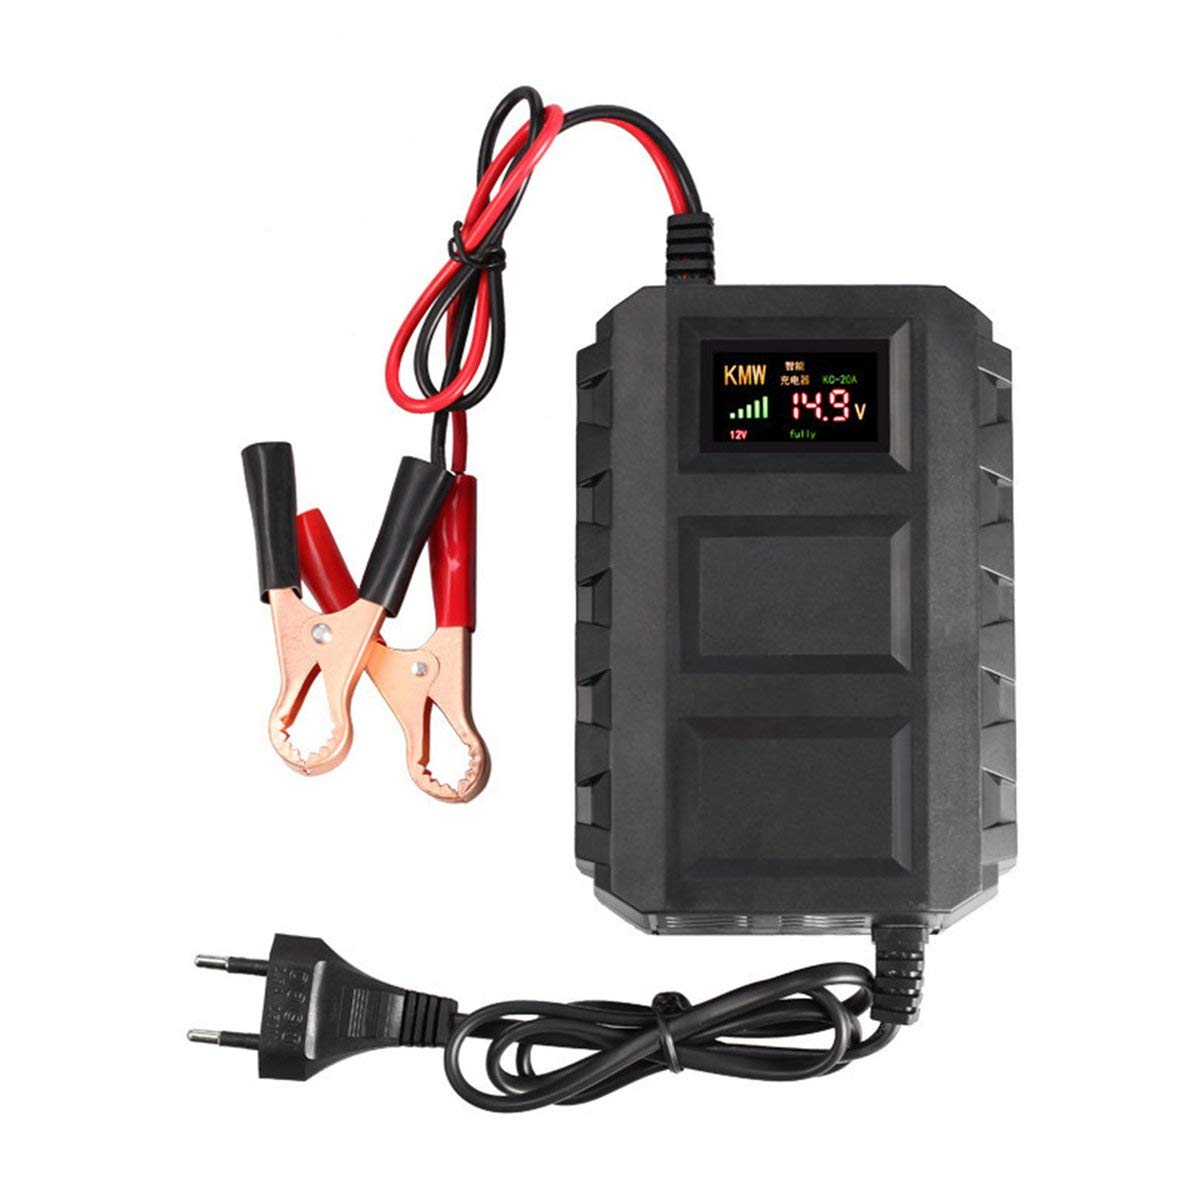 Intelligente 12 V 20A Autobatterie Bleisä ure Ladegerä t Schnell Lade LCD Display Auto Motorrad Ladegerä t Moliies